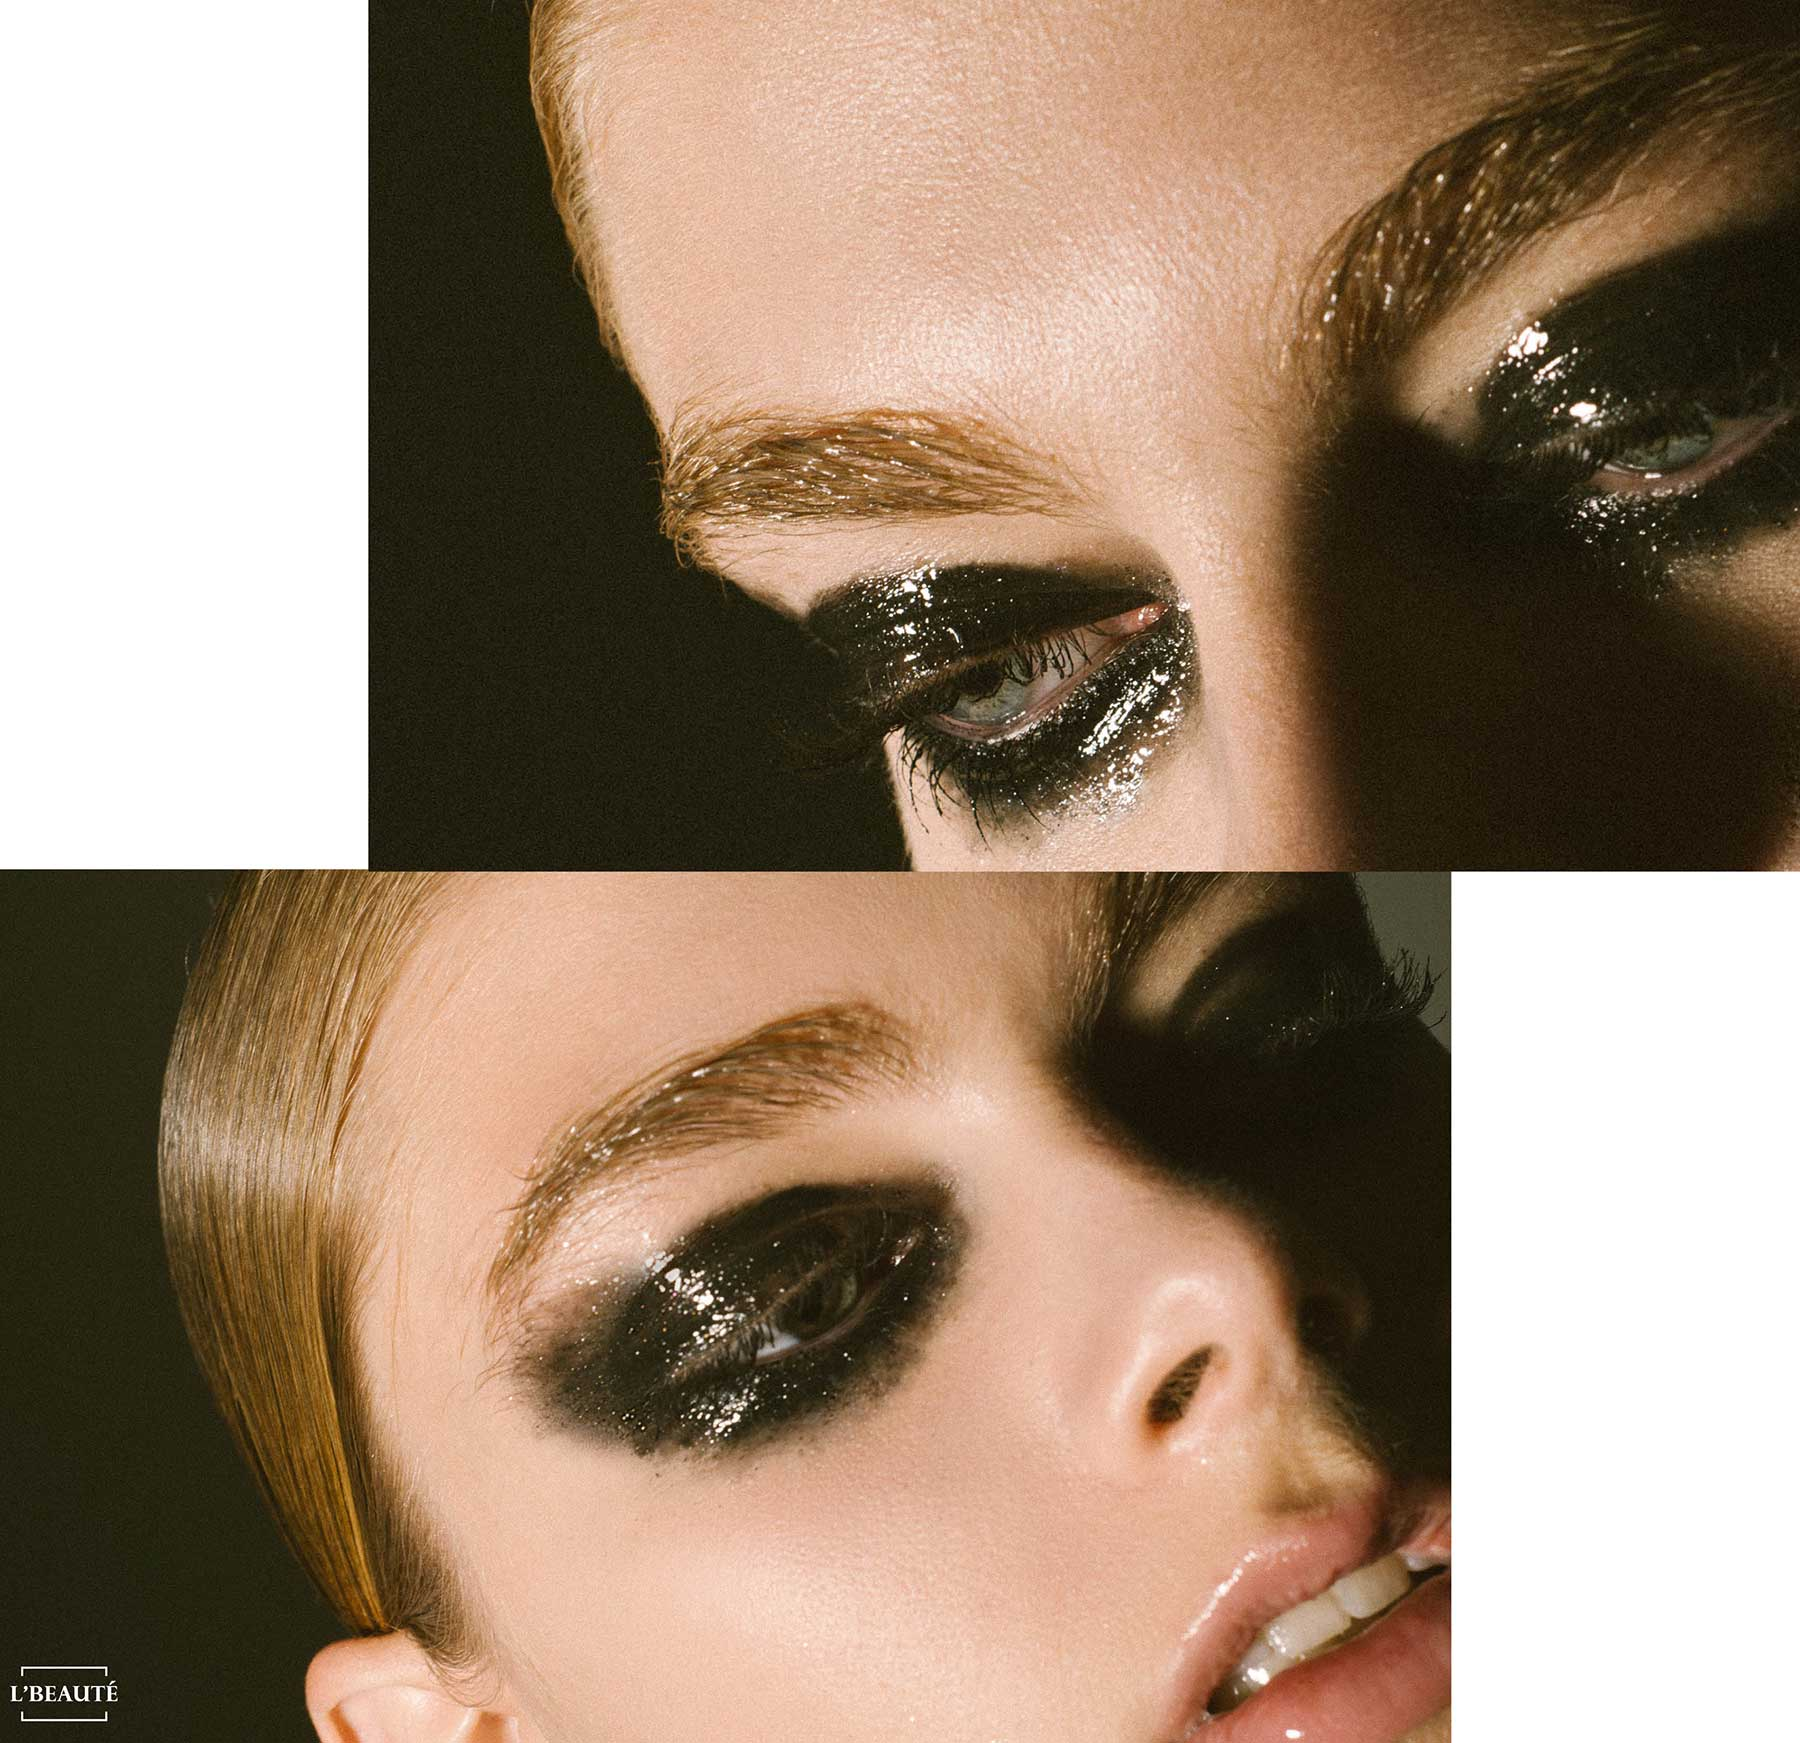 Beauty-Givenchy-Nicolas-Degennes4